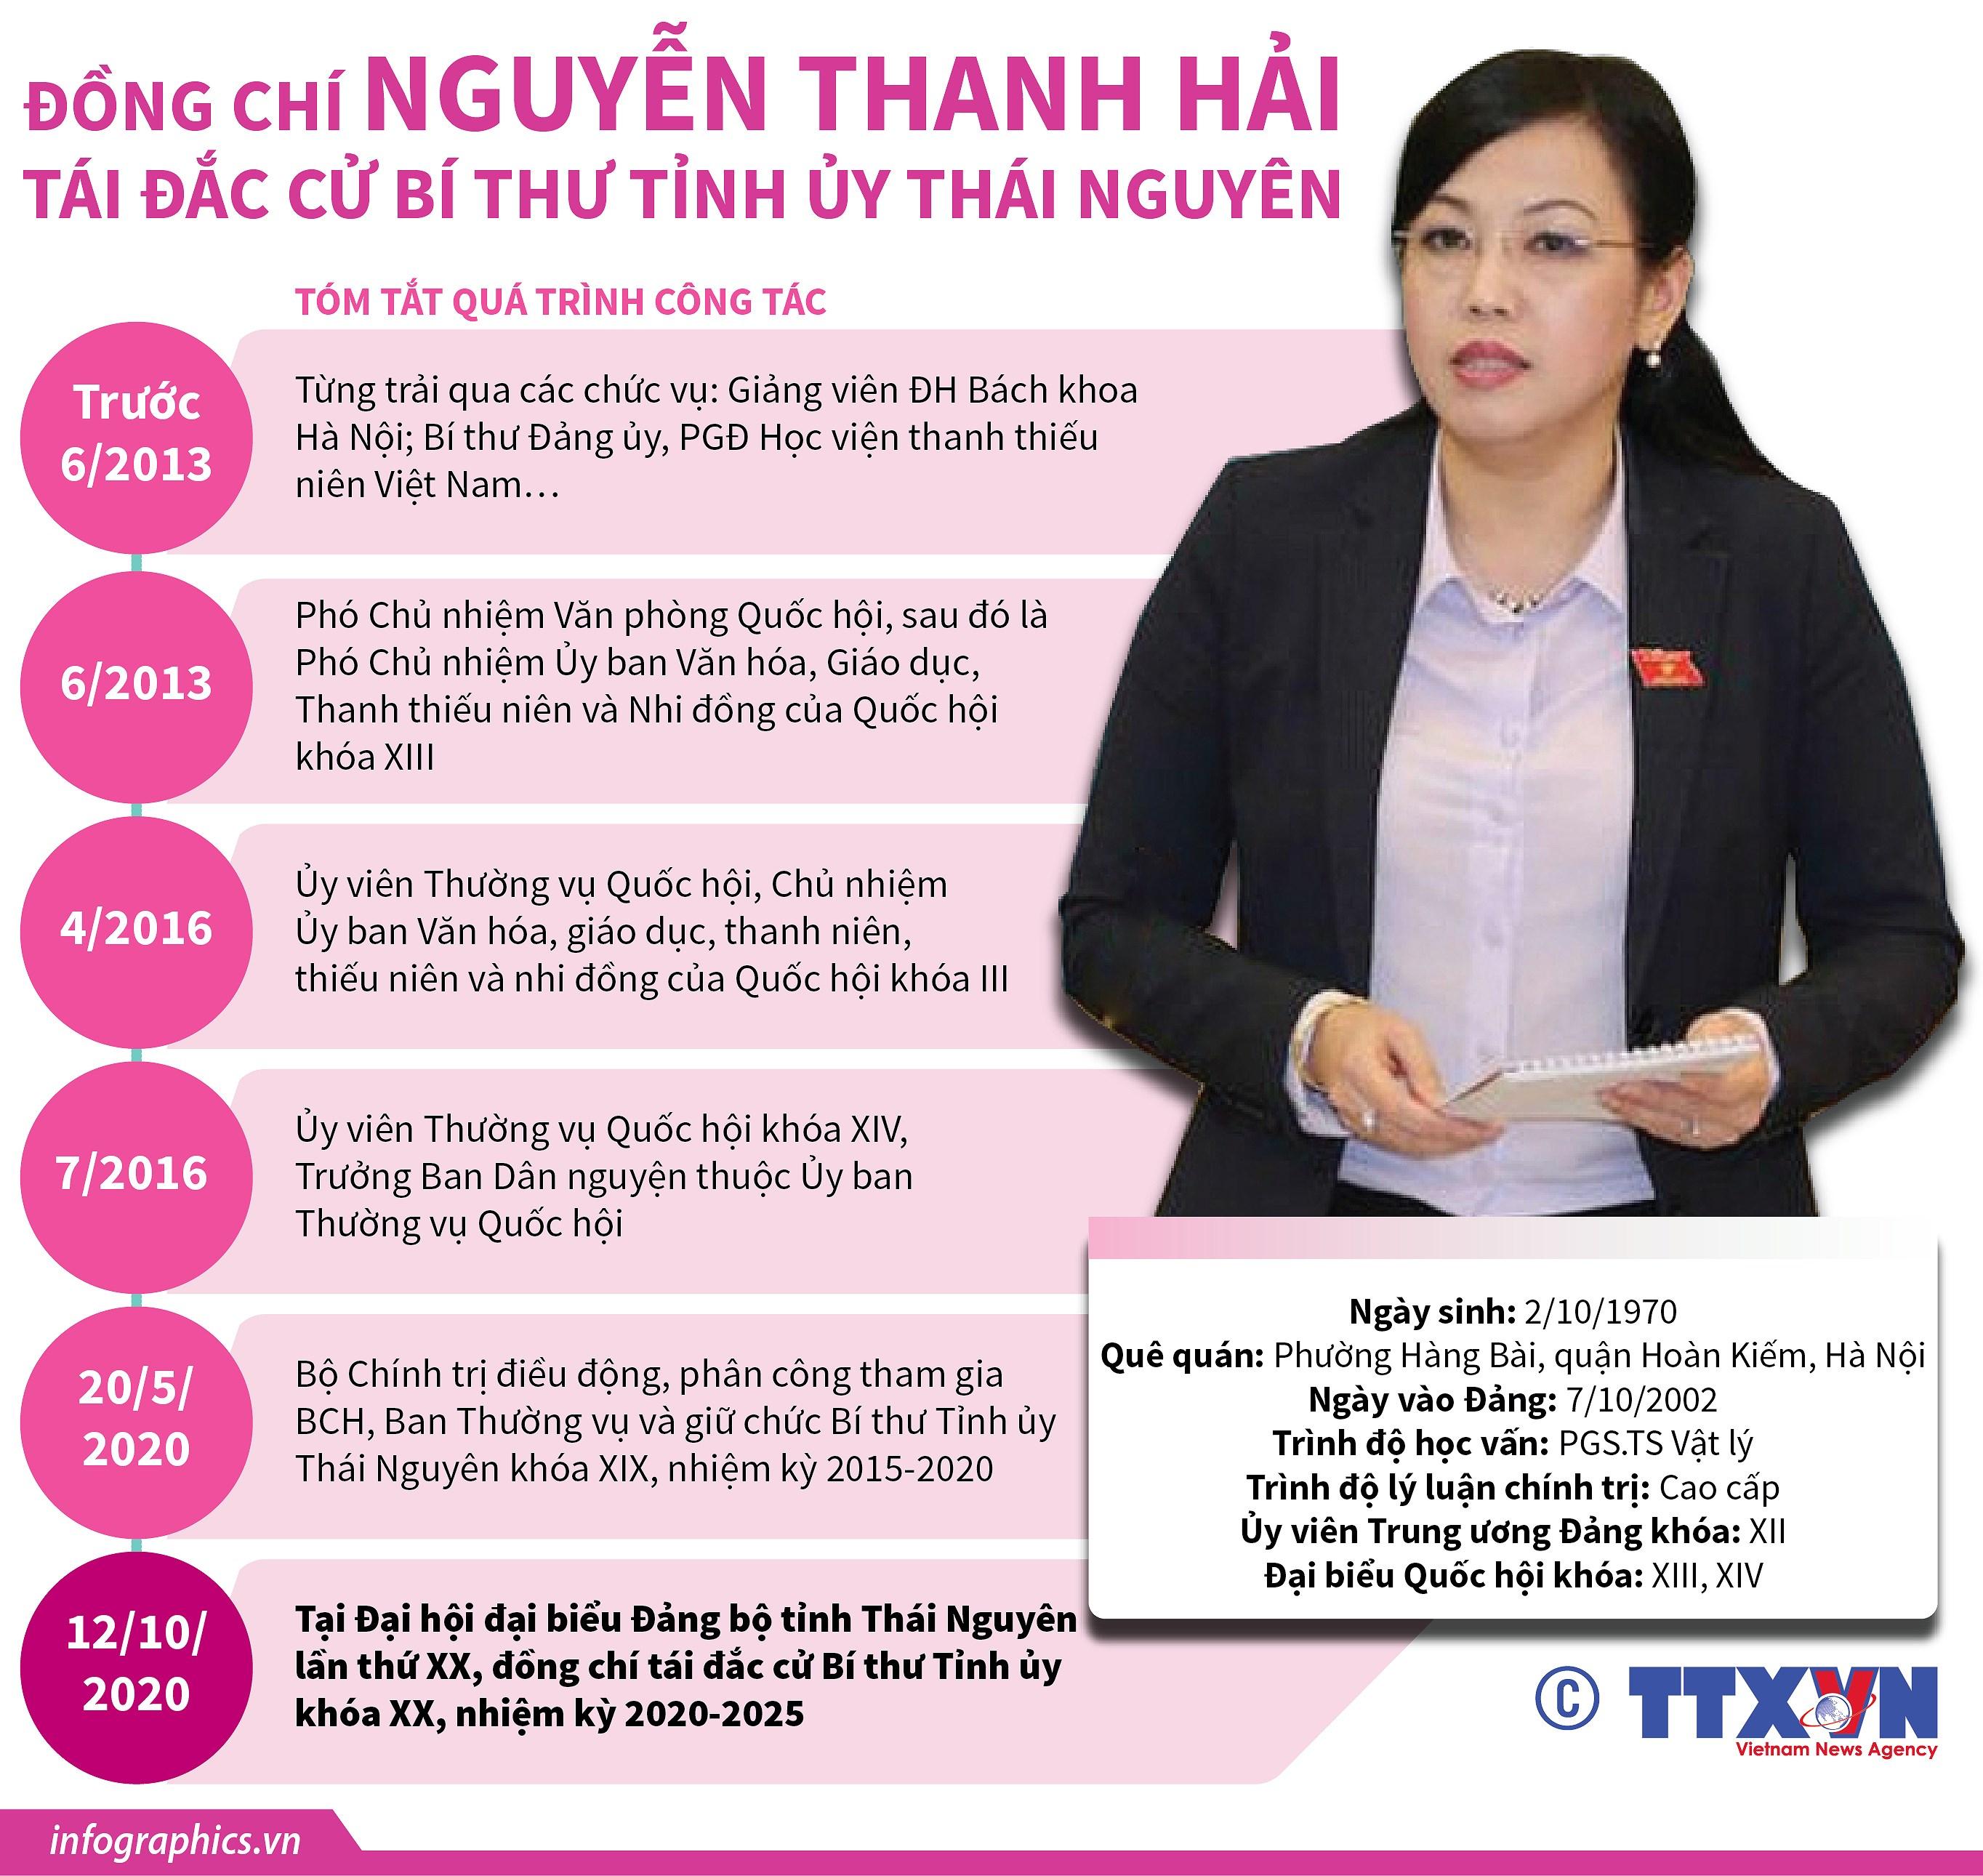 [Infographics] Ba Nguyen Thanh Hai tai cu Bi thu Tinh uy Thai Nguyen hinh anh 1